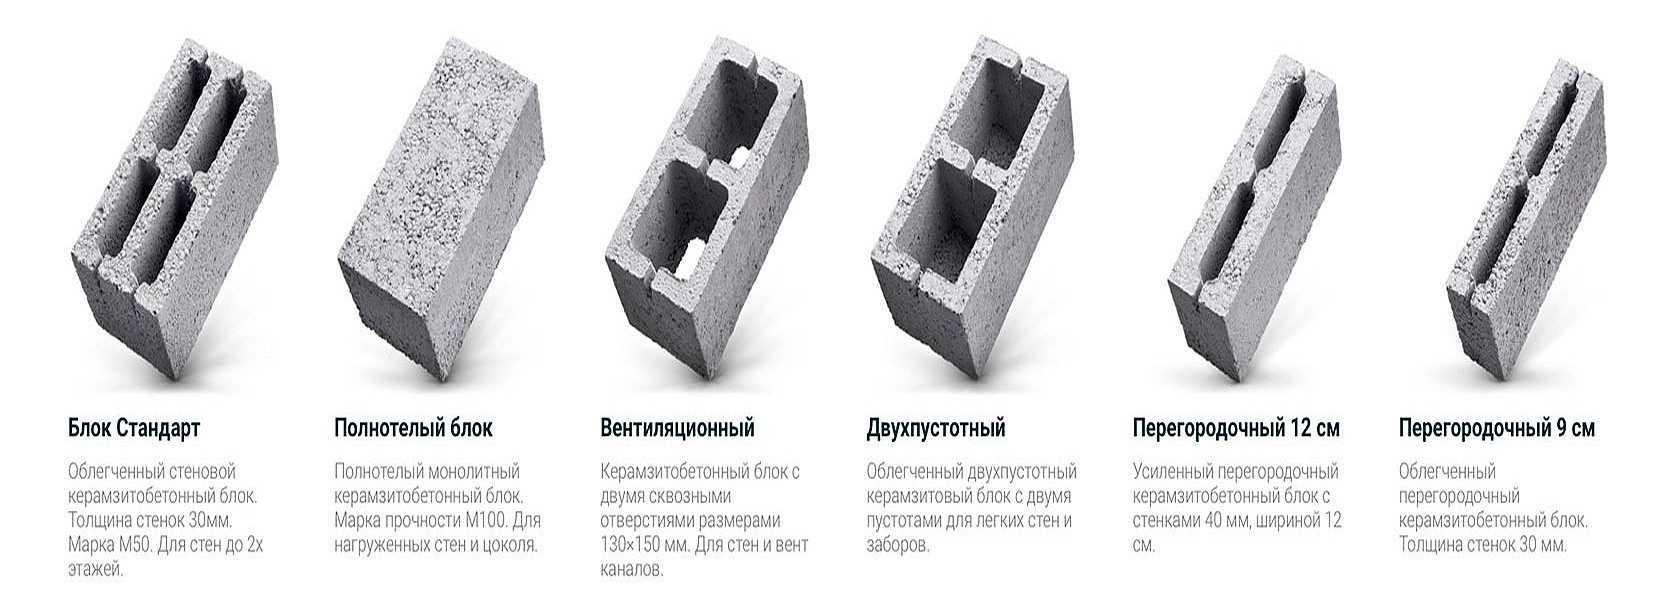 Керамзитобетон vs бетон в юао купить